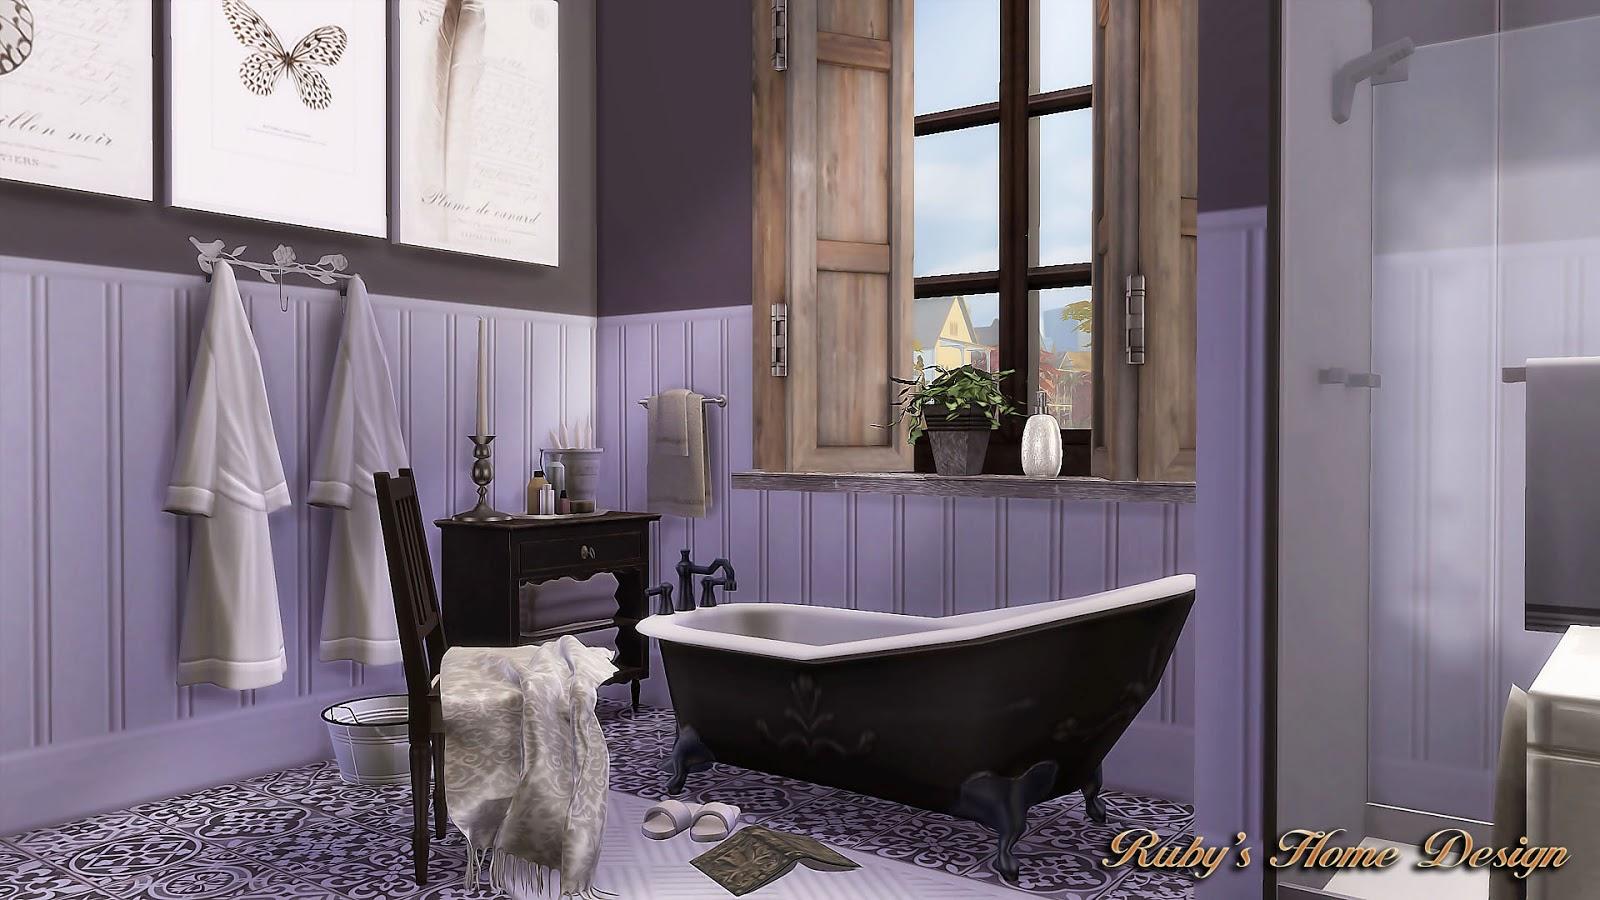 Zara Home Coleccion Otono 2016 moreover Grey Bathrooms Ideas as well Lavabos Sobre Encimera Madera in addition Claves Para Decorar Una Casa De C o in addition The Futuristic Dwelling Machine That Could Have Been. on y chic interior design